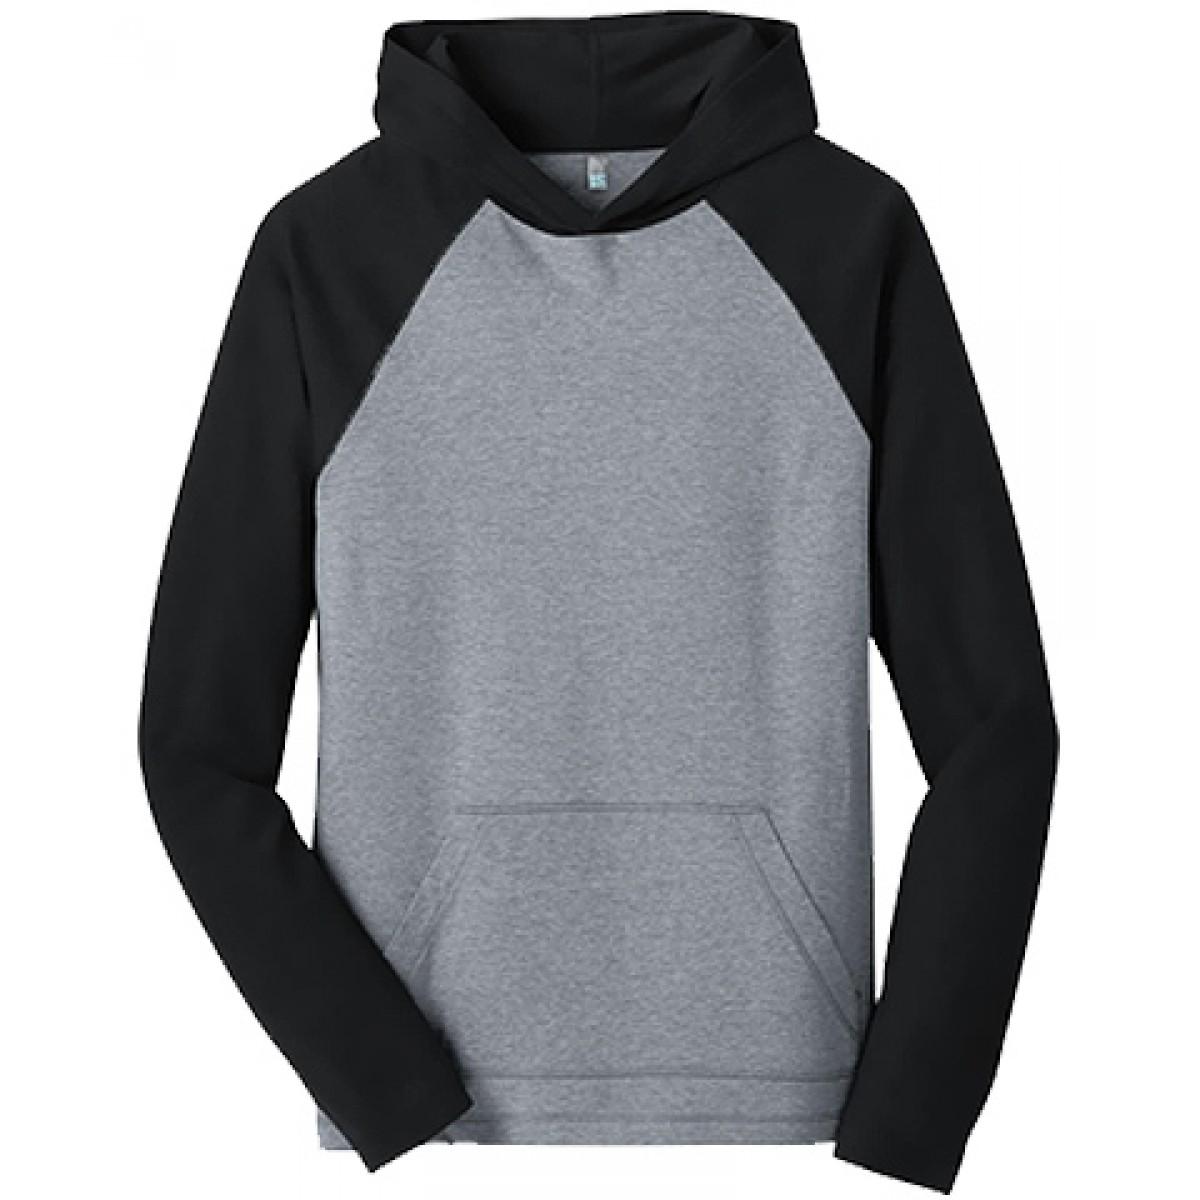 50/50 Raglan Hoodie-Gray/Black-2XL